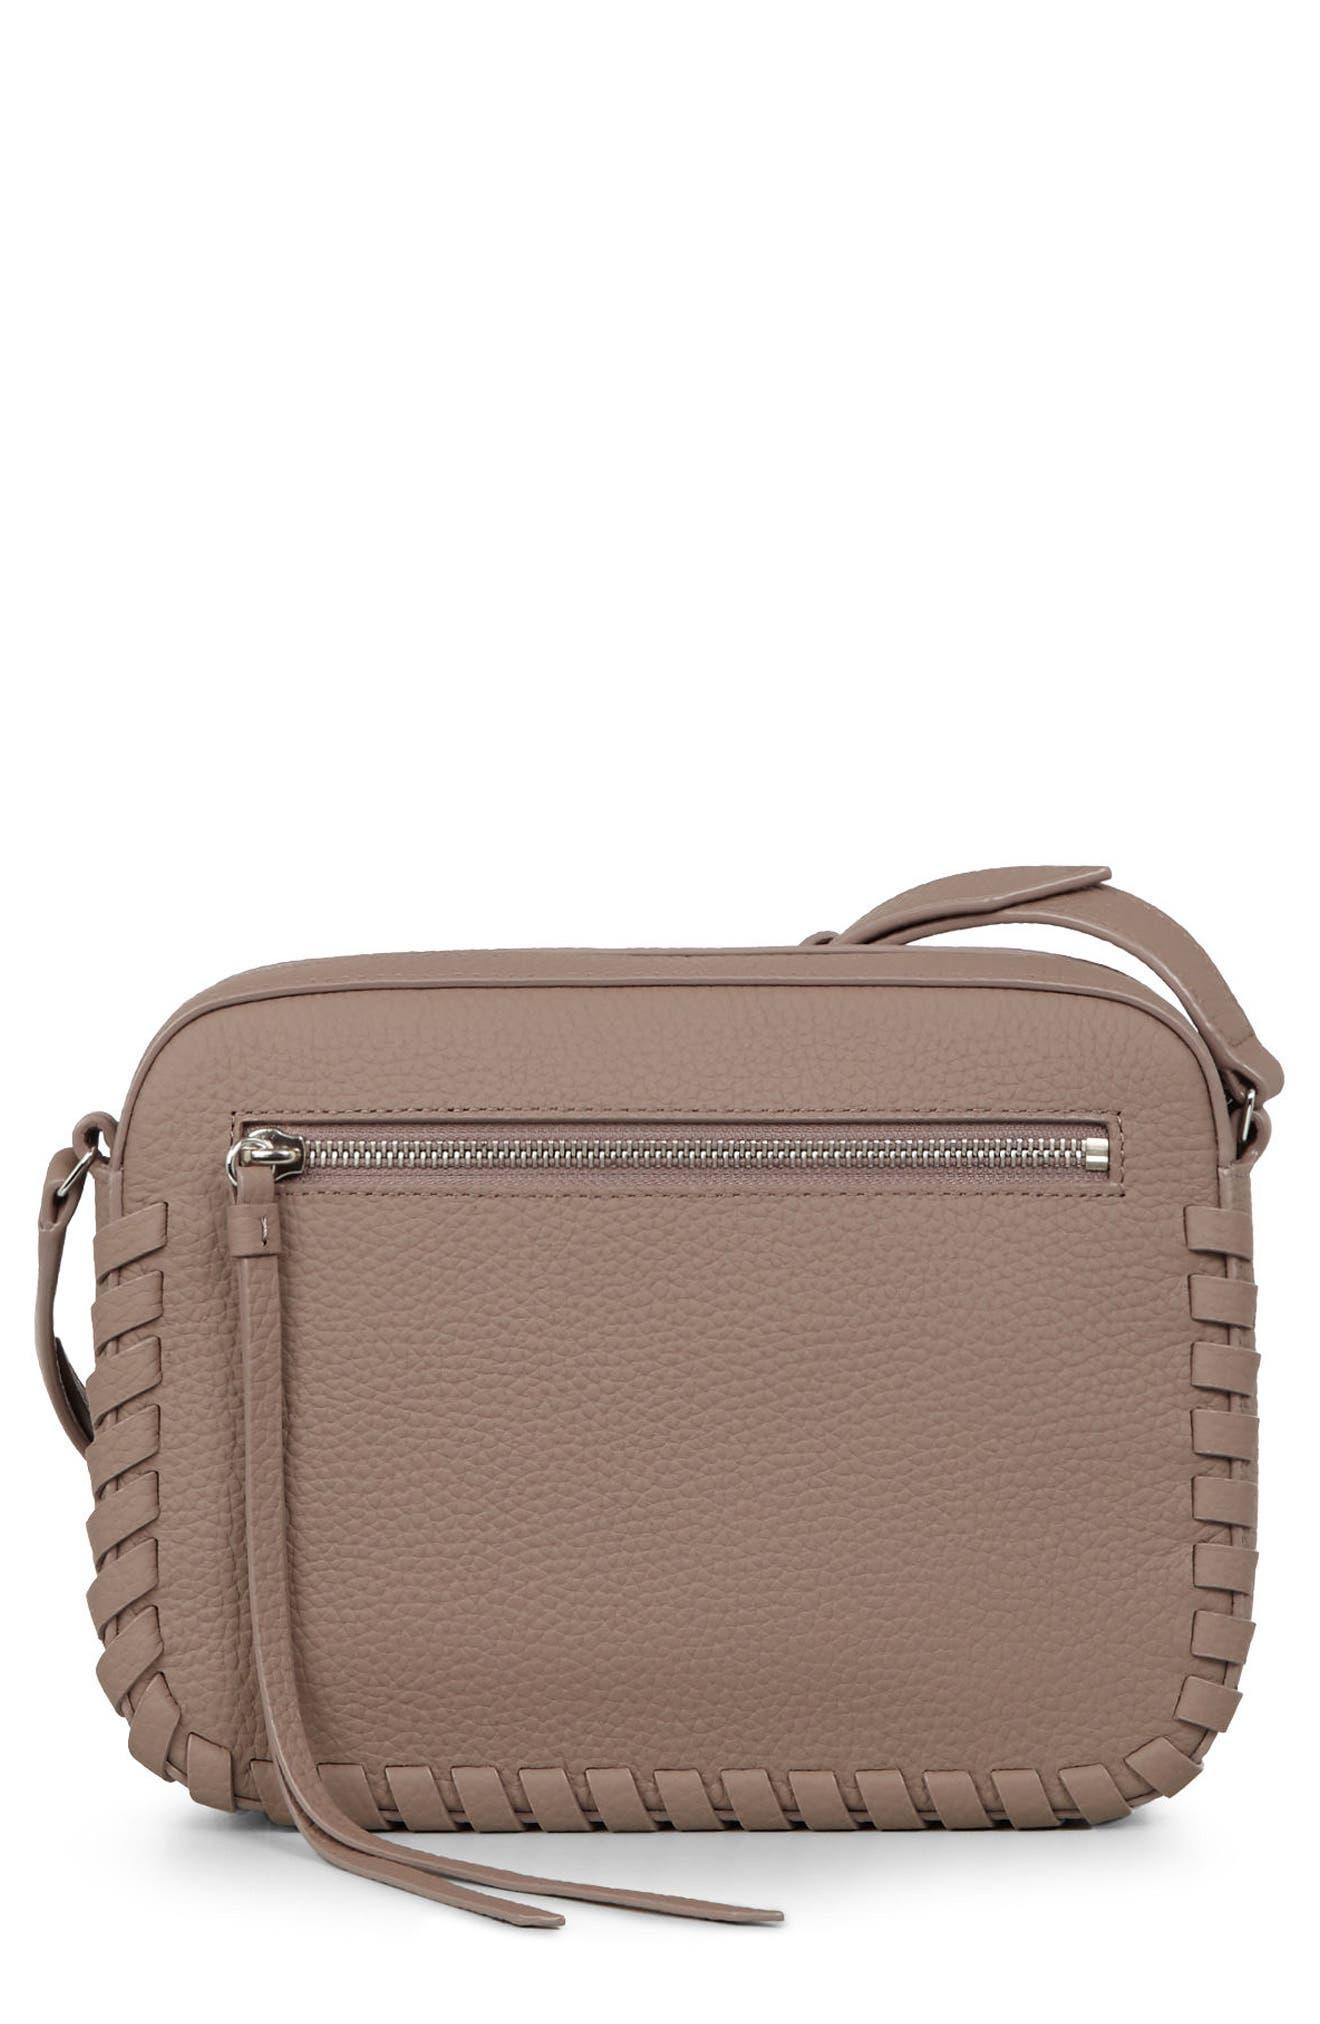 Kepi Mini Leather Crossbody Bag,                             Main thumbnail 1, color,                             ALMOND BROWN